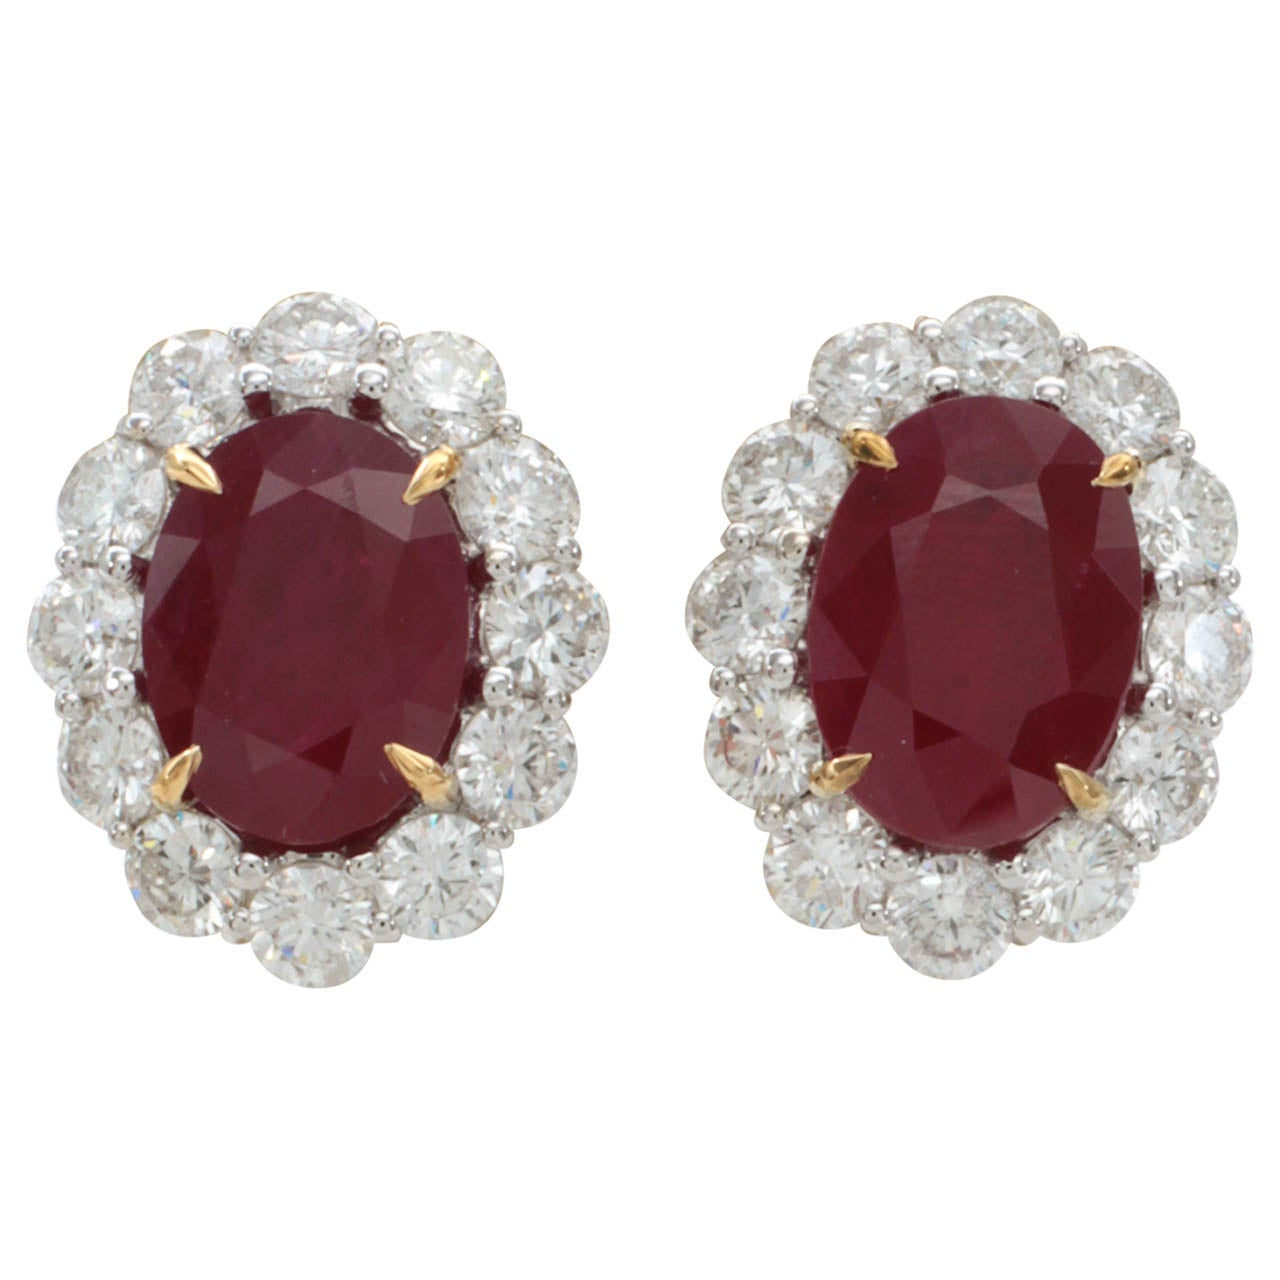 Rare Burma Ruby Diamond Earrings For Sale At 1stdibs